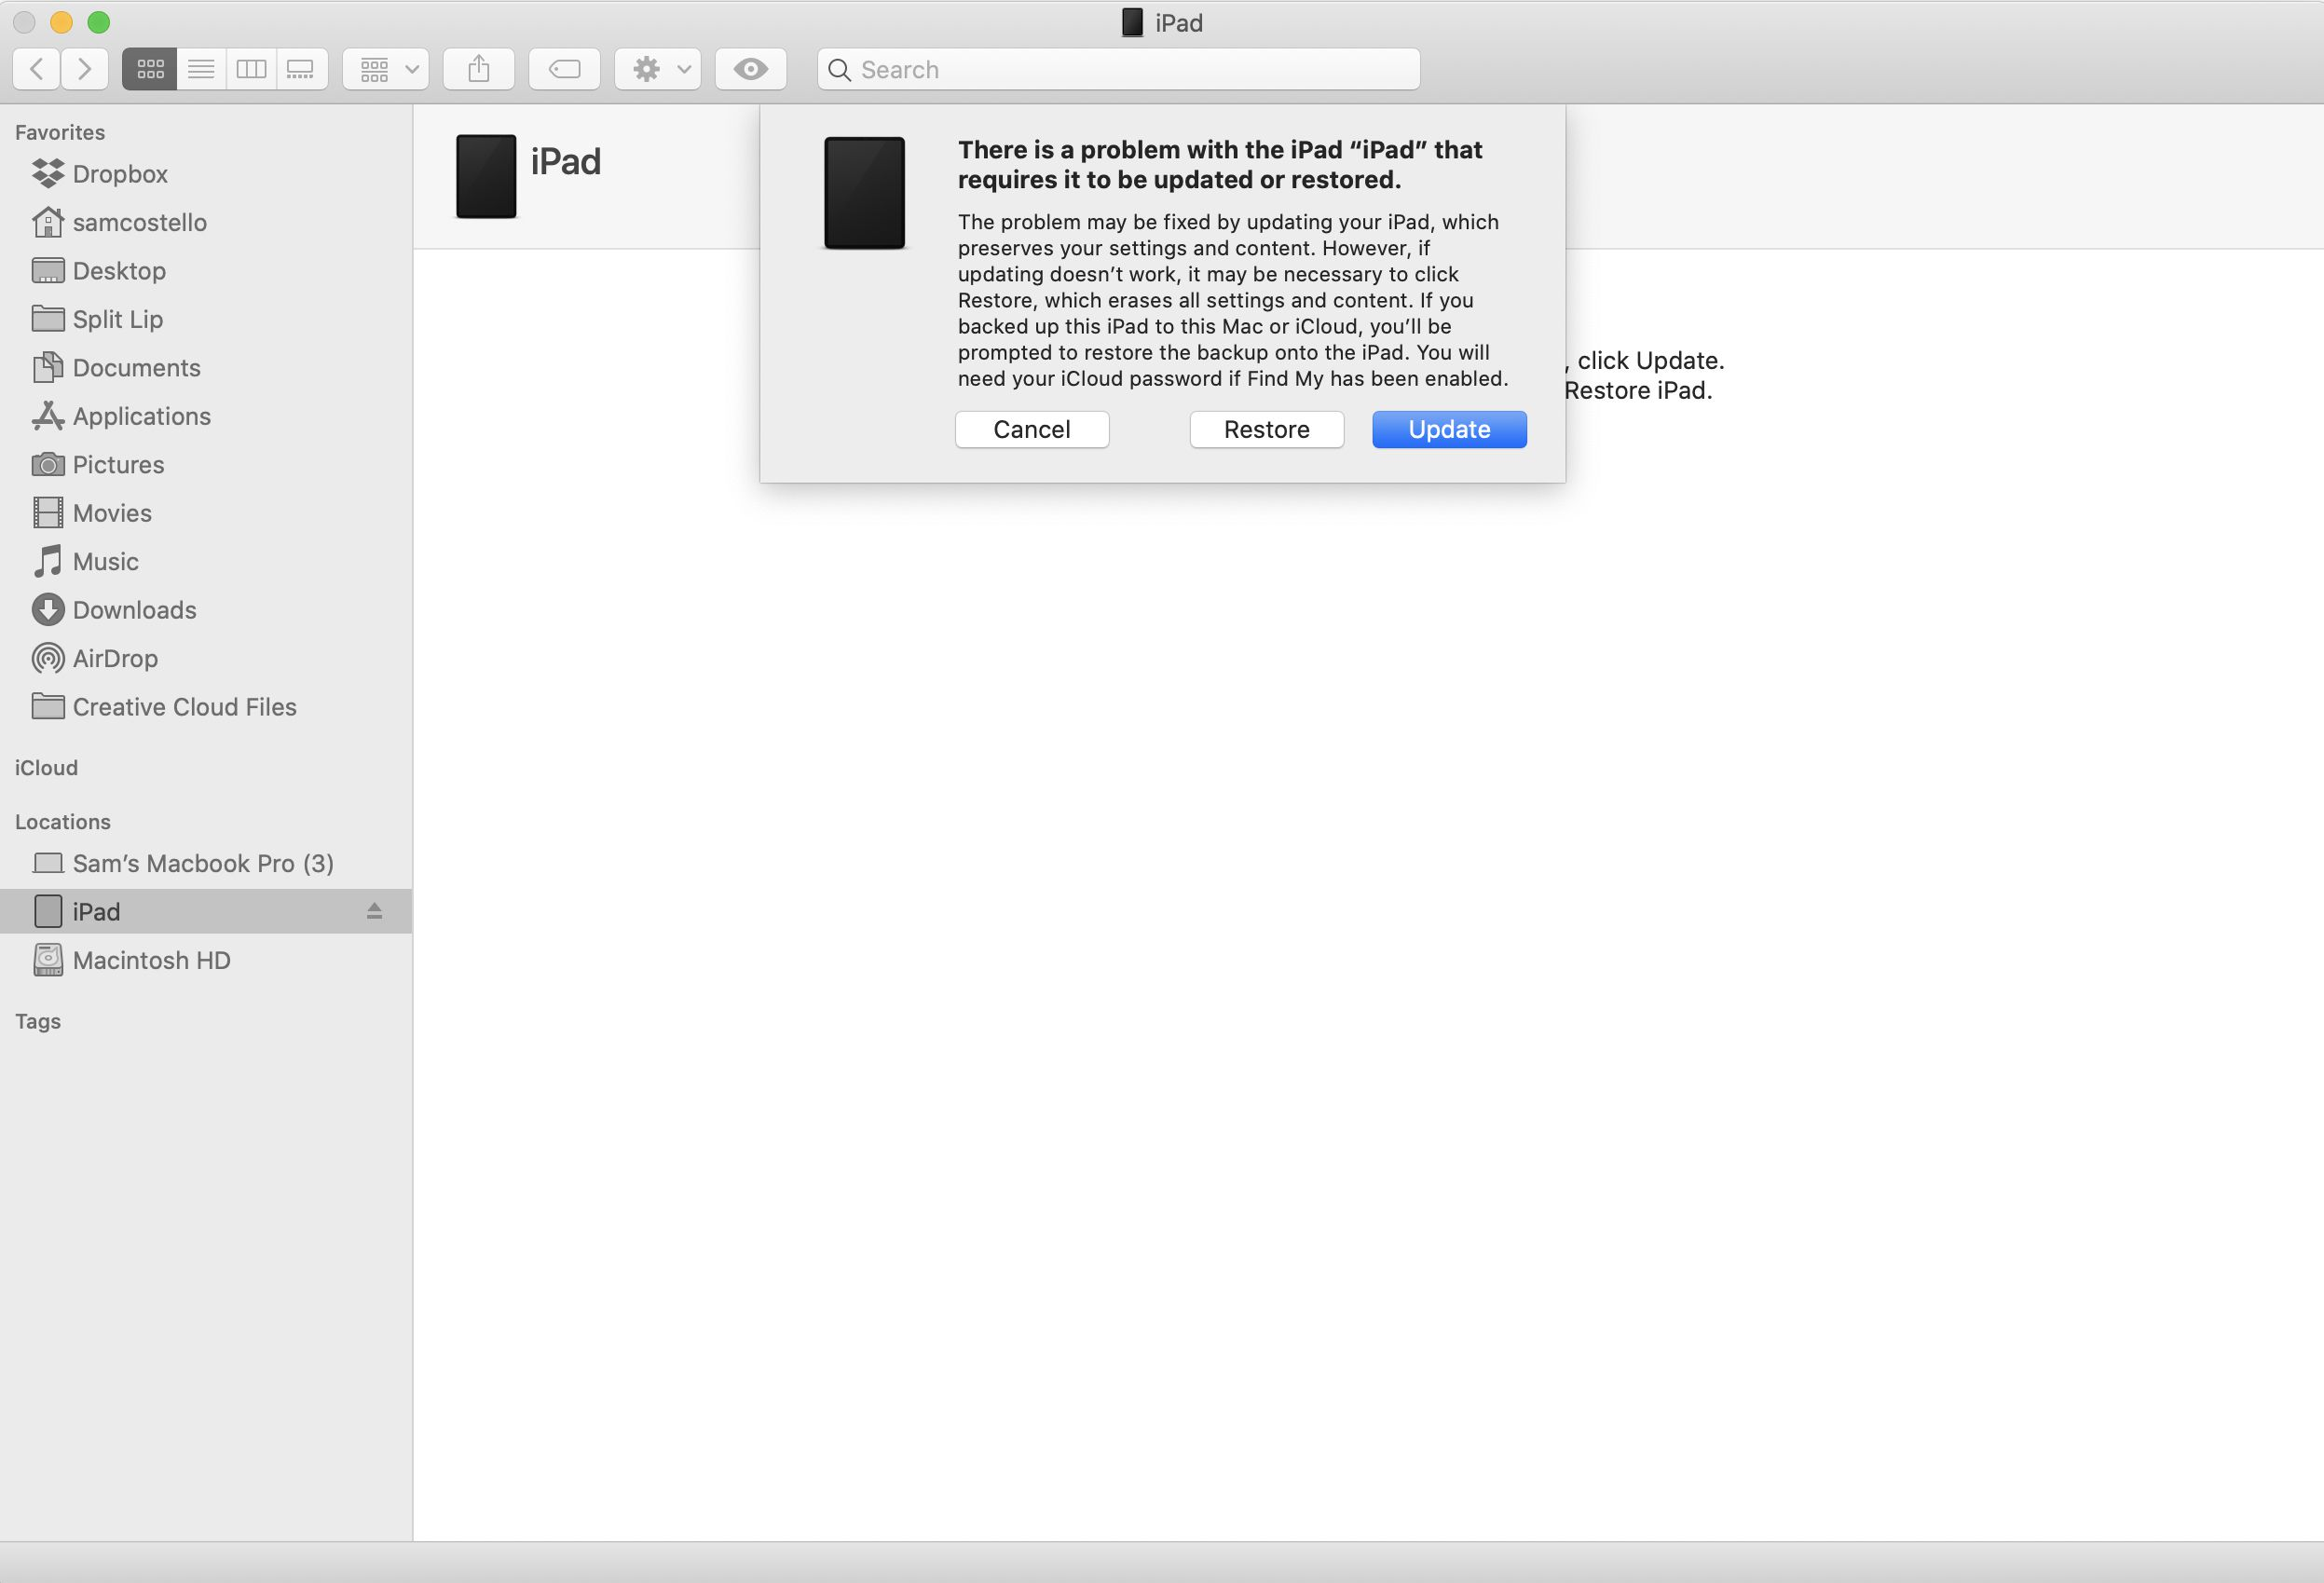 Screenshot of restoring an iPad on the Mac